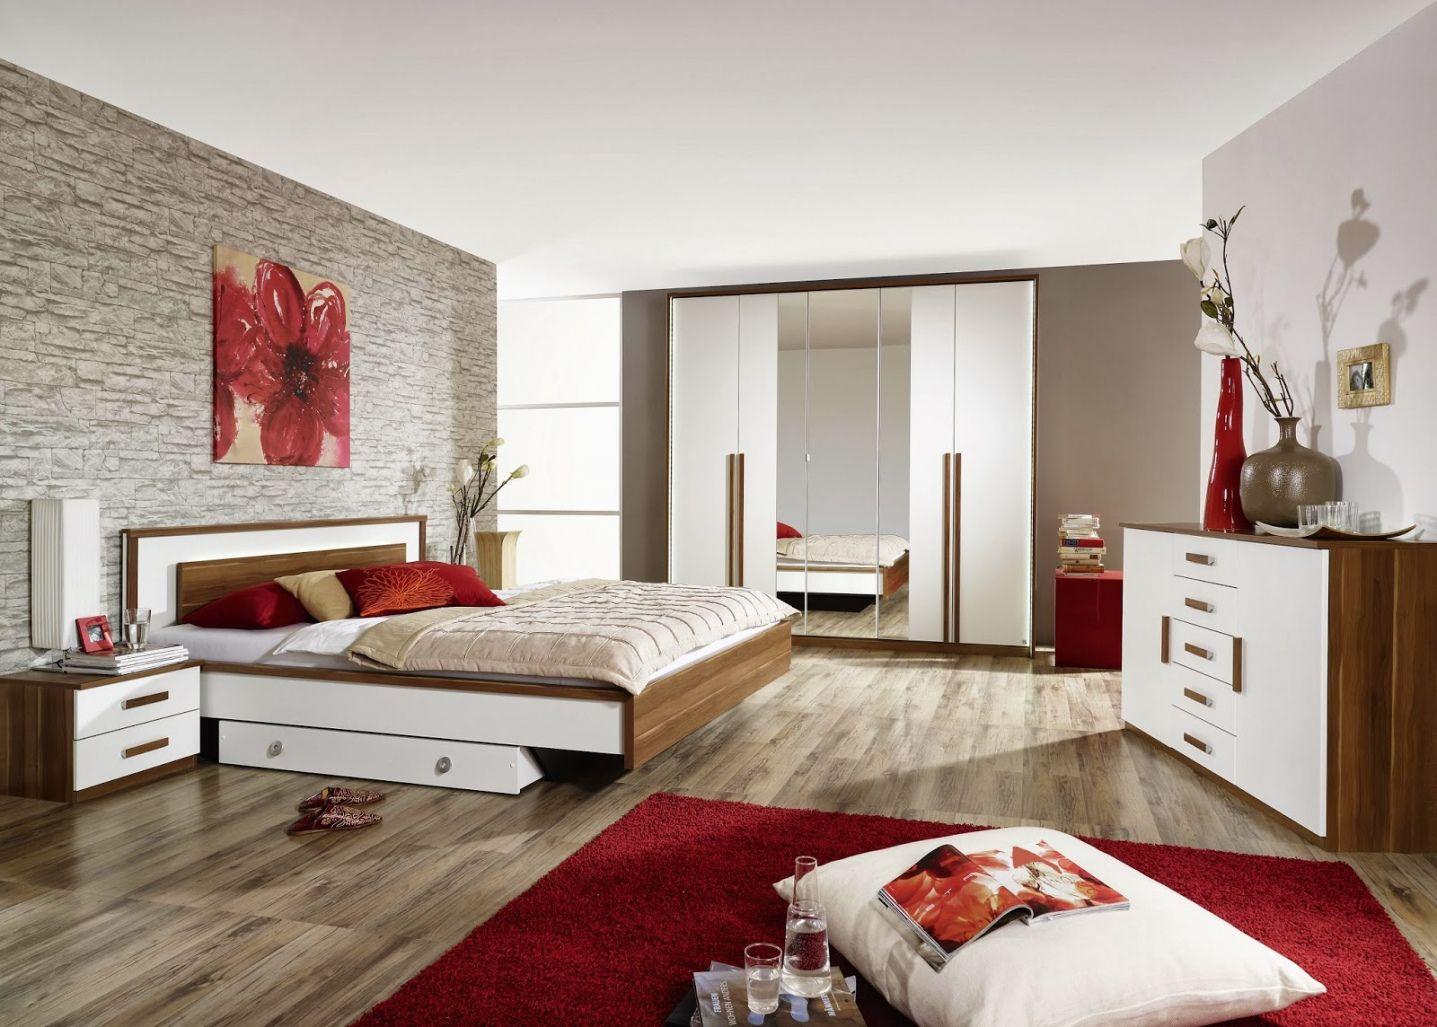 Bedroom window ideas  modern bedroom designs for couples  bedroom window treatment ideas